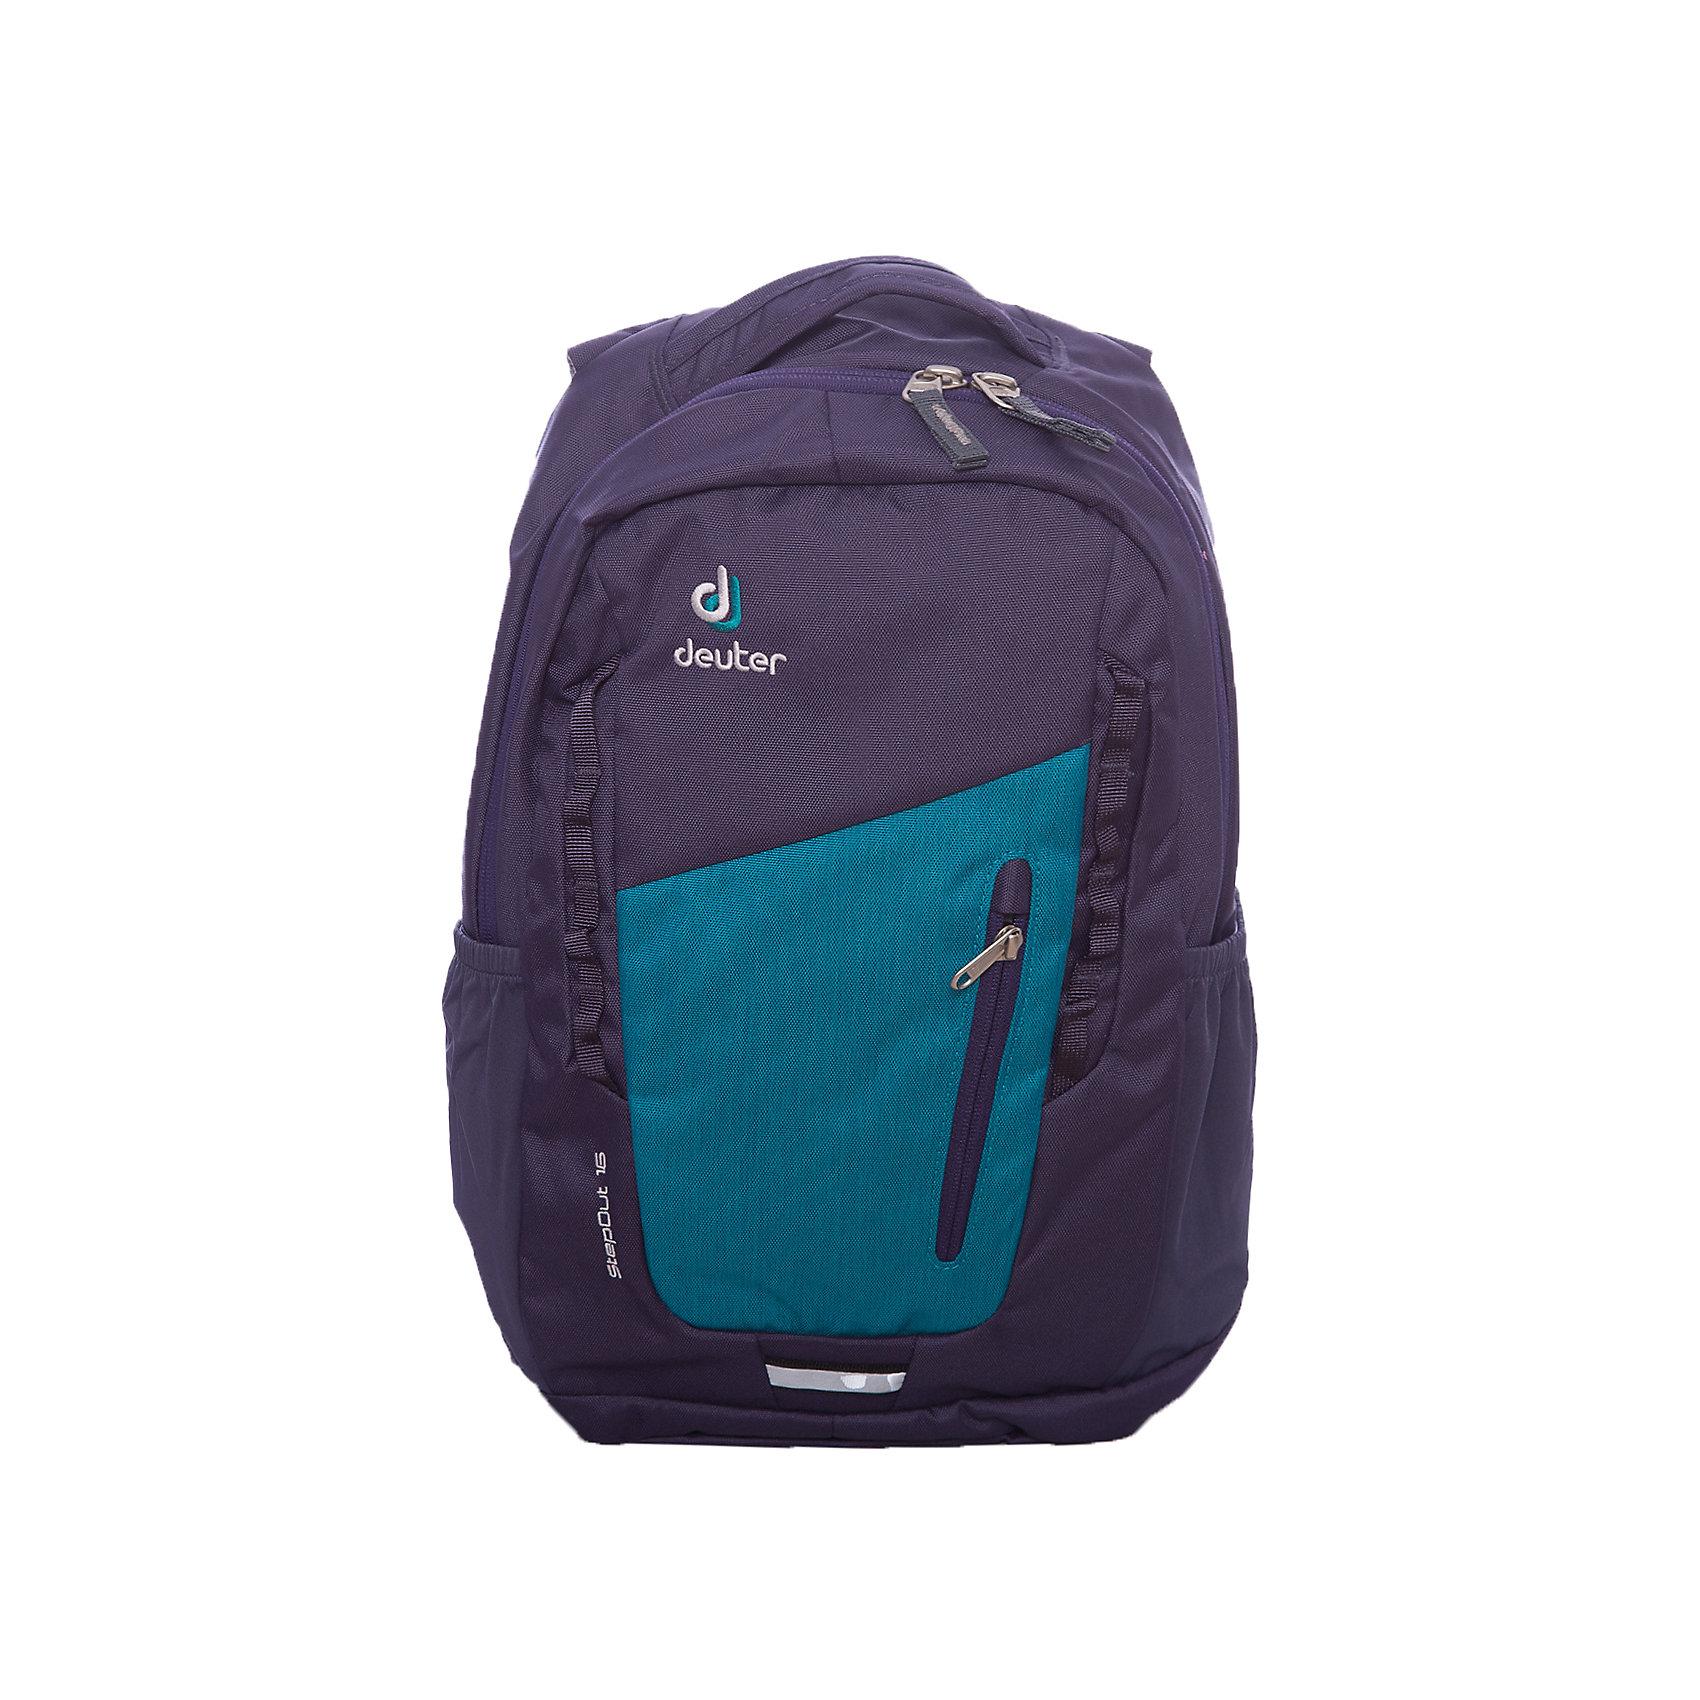 Deuter Рюкзак Stepout  16, фиолетово-синий